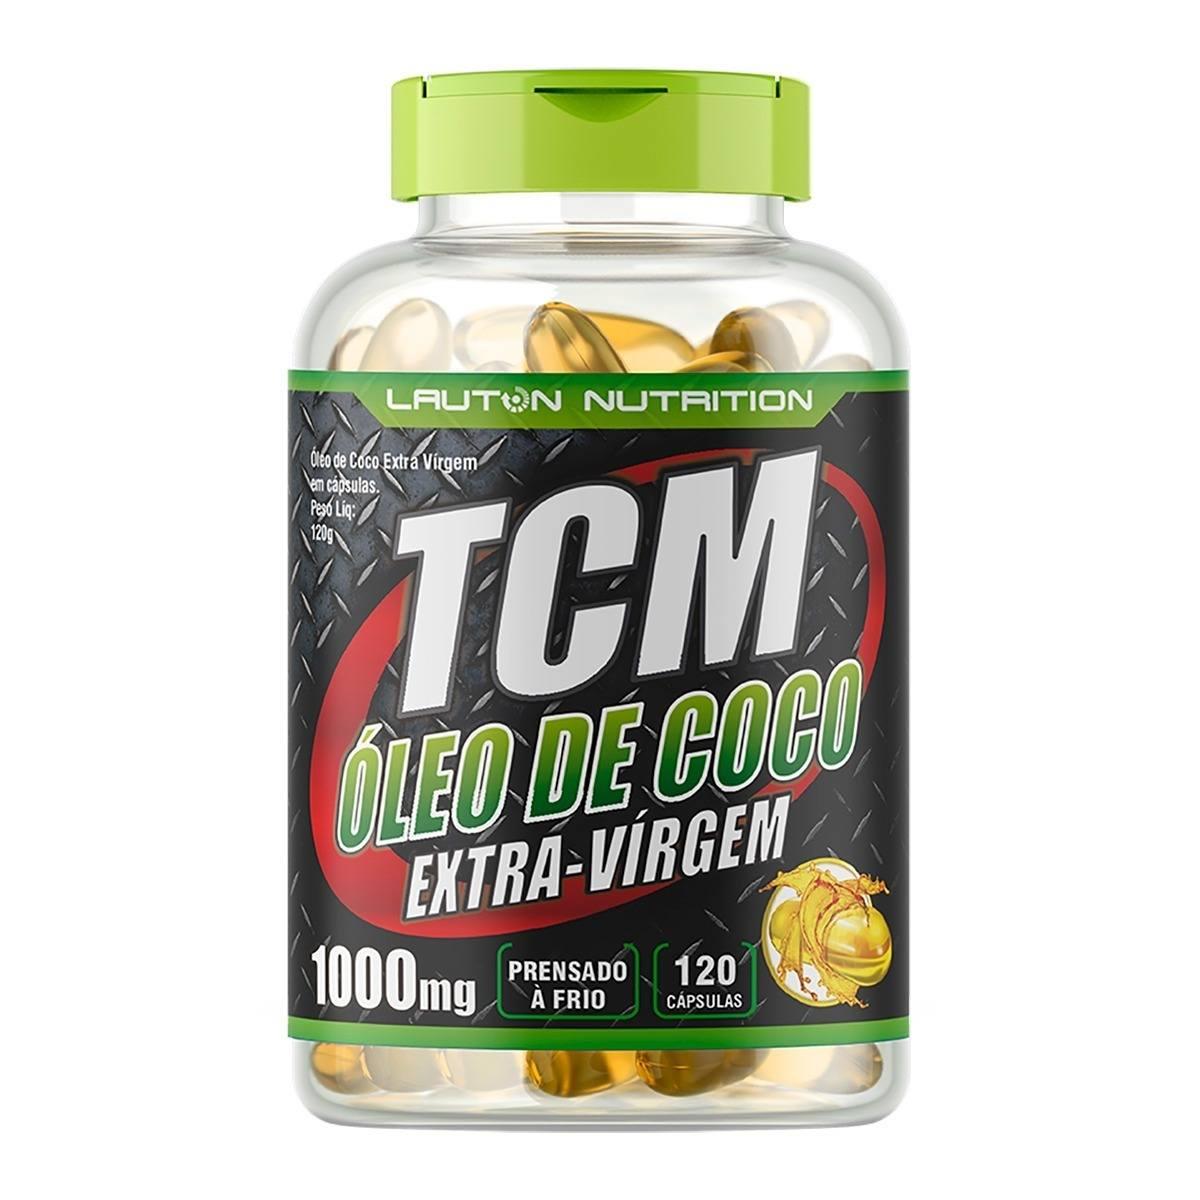 Oleo De Coco Tcm 120 Cap 1000Mg Lauton Nutrition